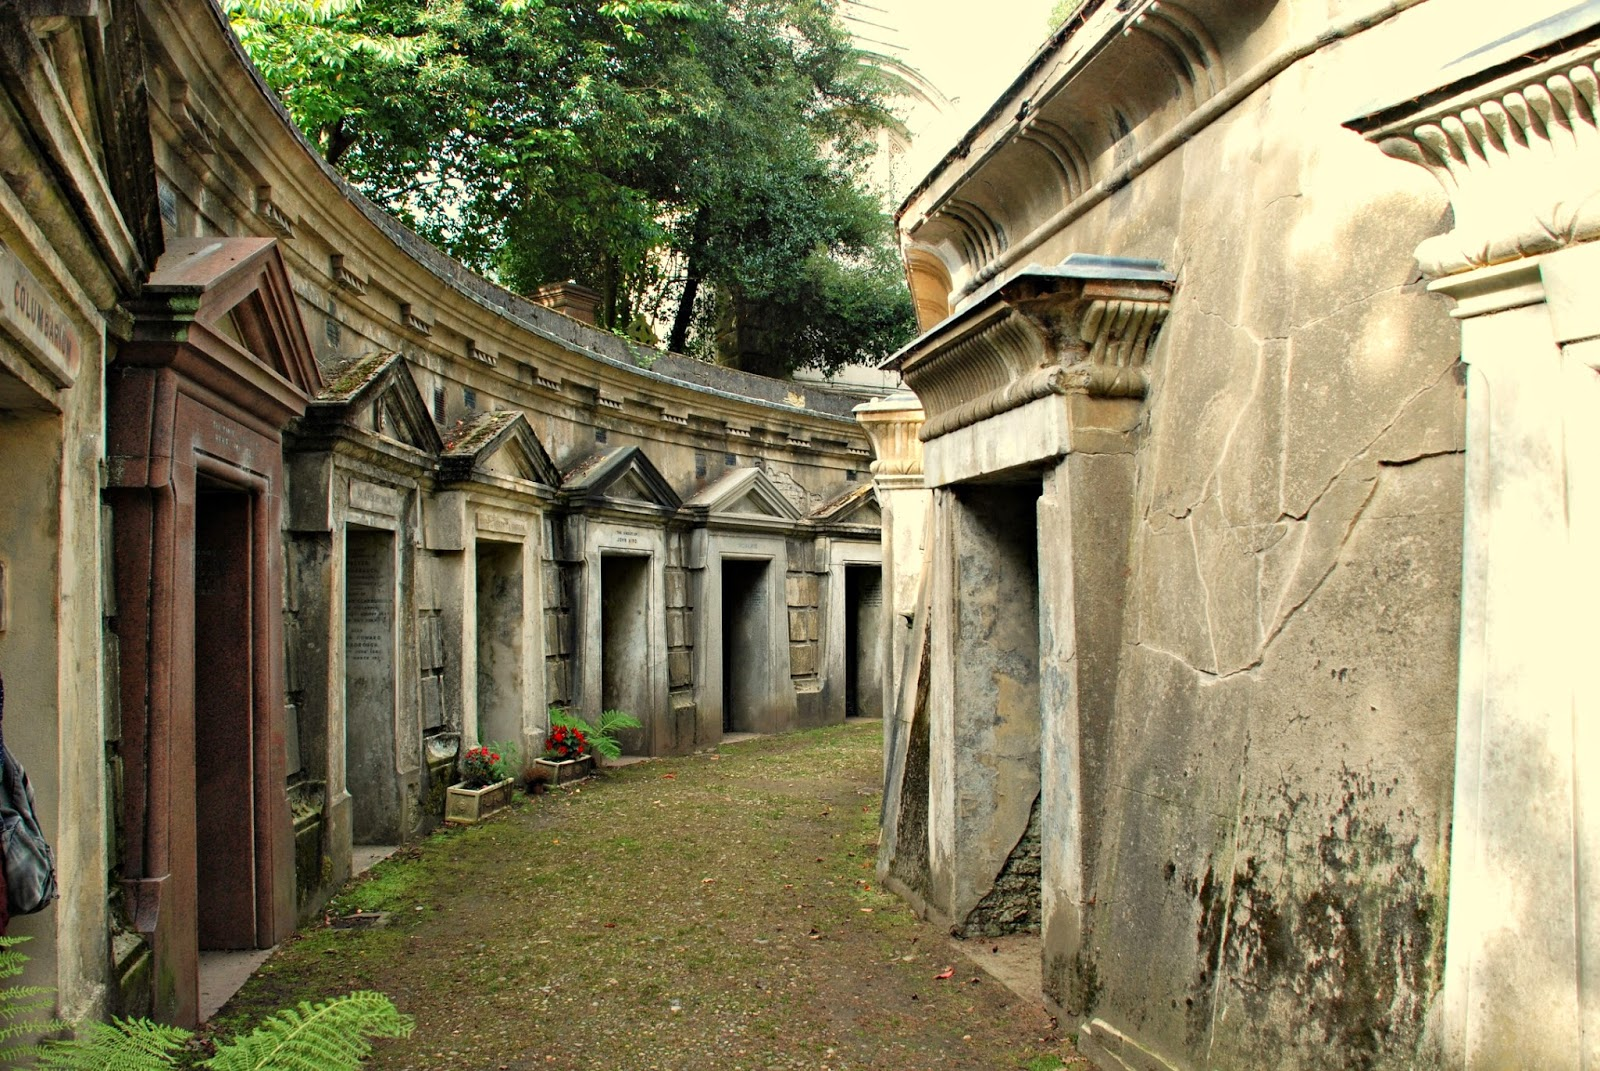 The Circle of Lebanon, Highgate Cemetery, London